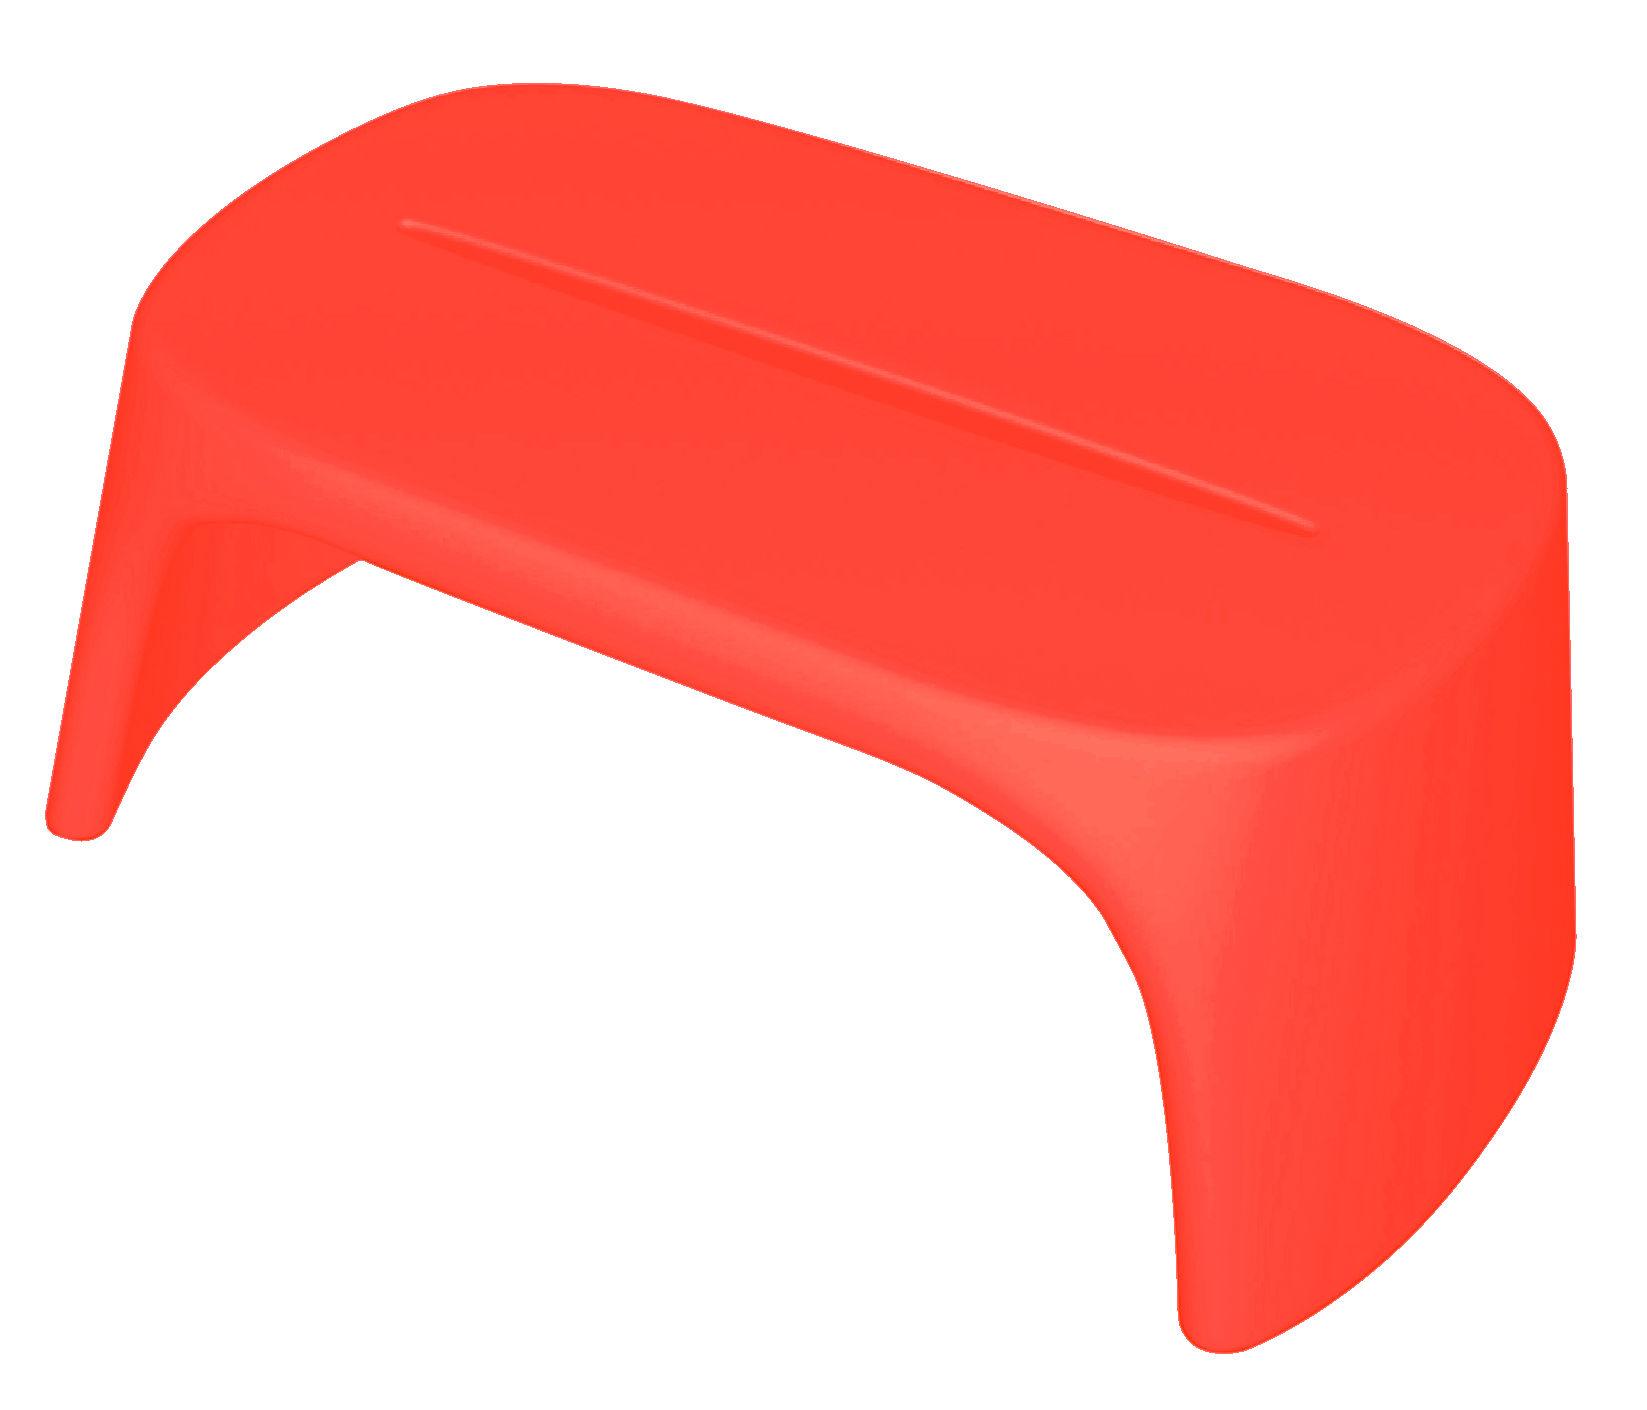 Arredamento - Tavolini  - Tavolino Amélie di Slide - Rosso - Polietilene